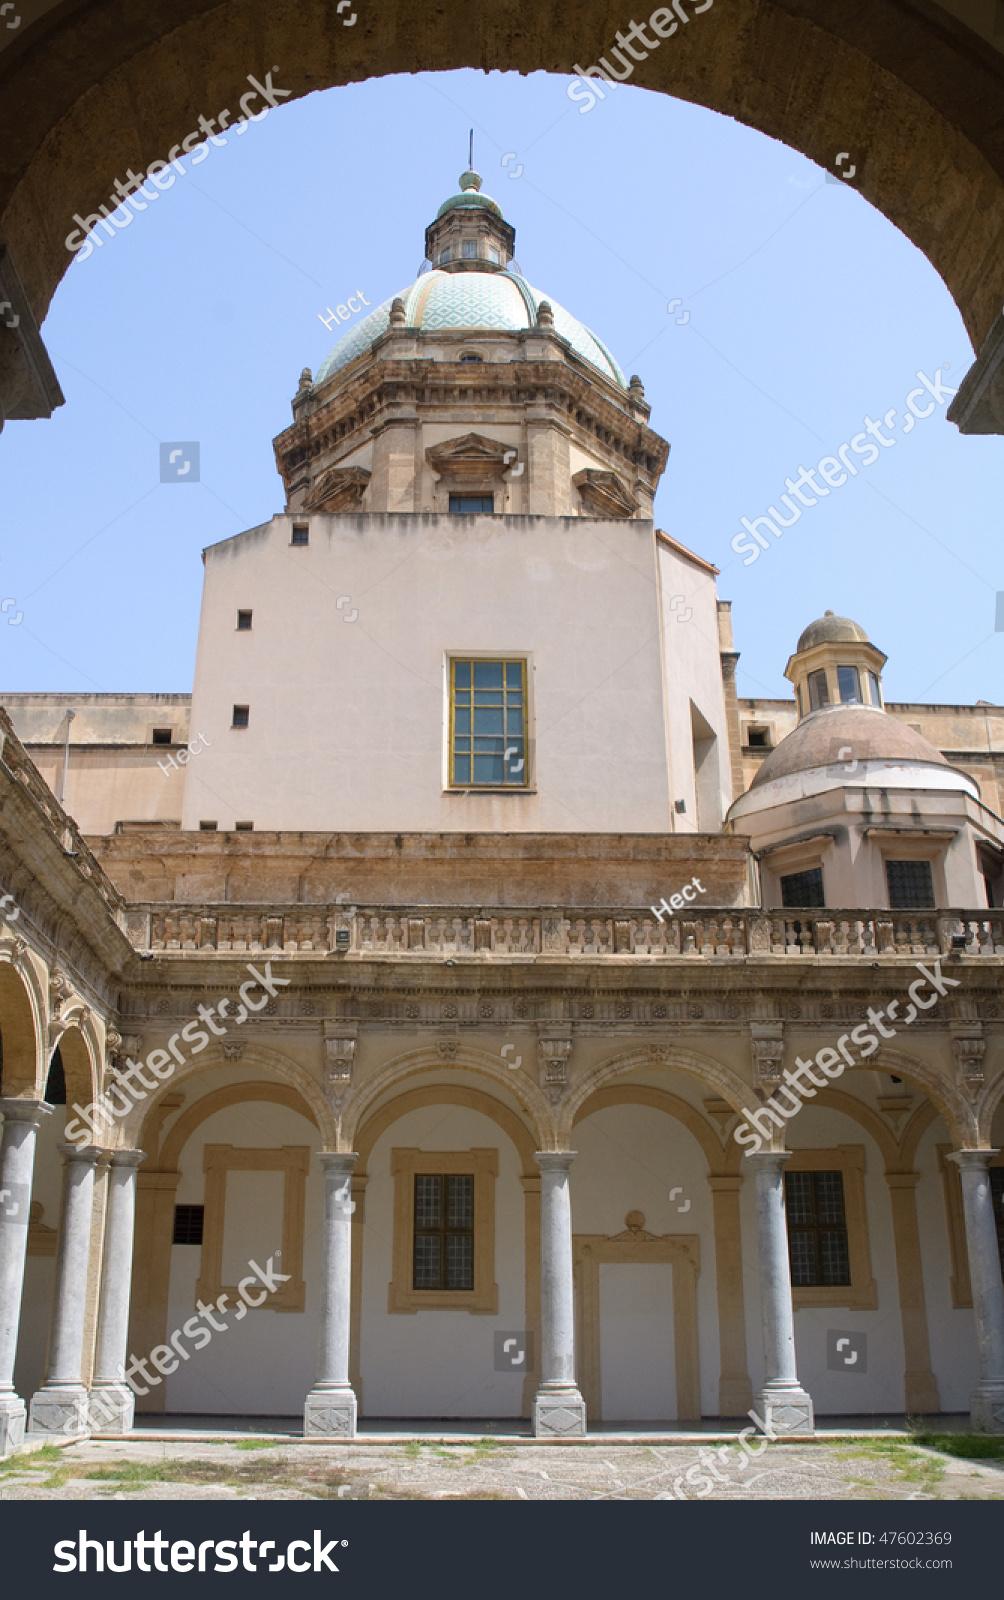 Casa Professa In Palermo Stock Photo 47602369  Shutterstock